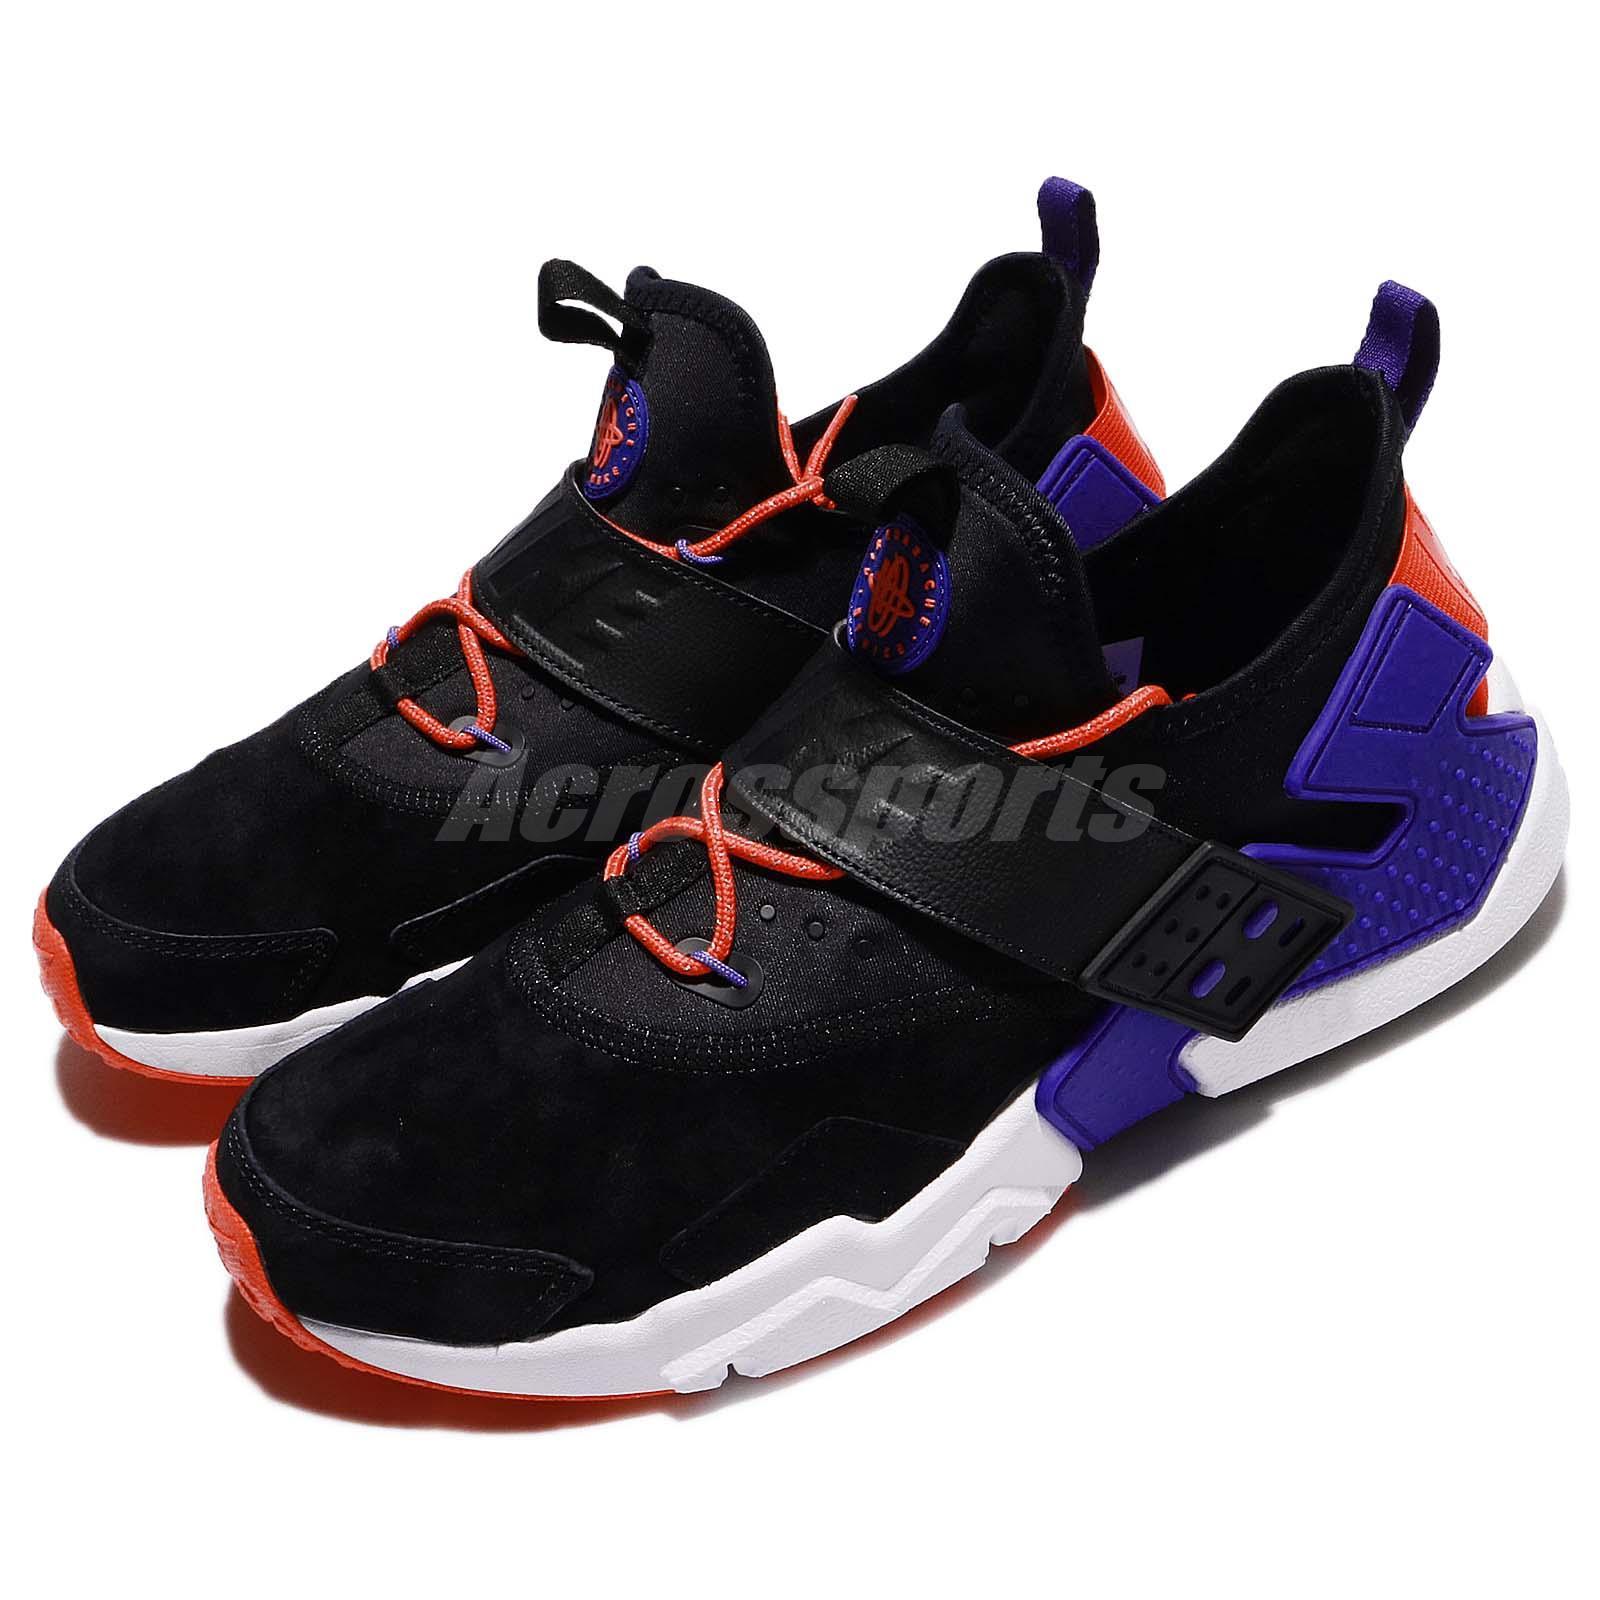 f3a036c5b4f Details about Nike Air Huarache Drift PRM Black Rush Violet Orange Men  Running Shoe AH7335-002